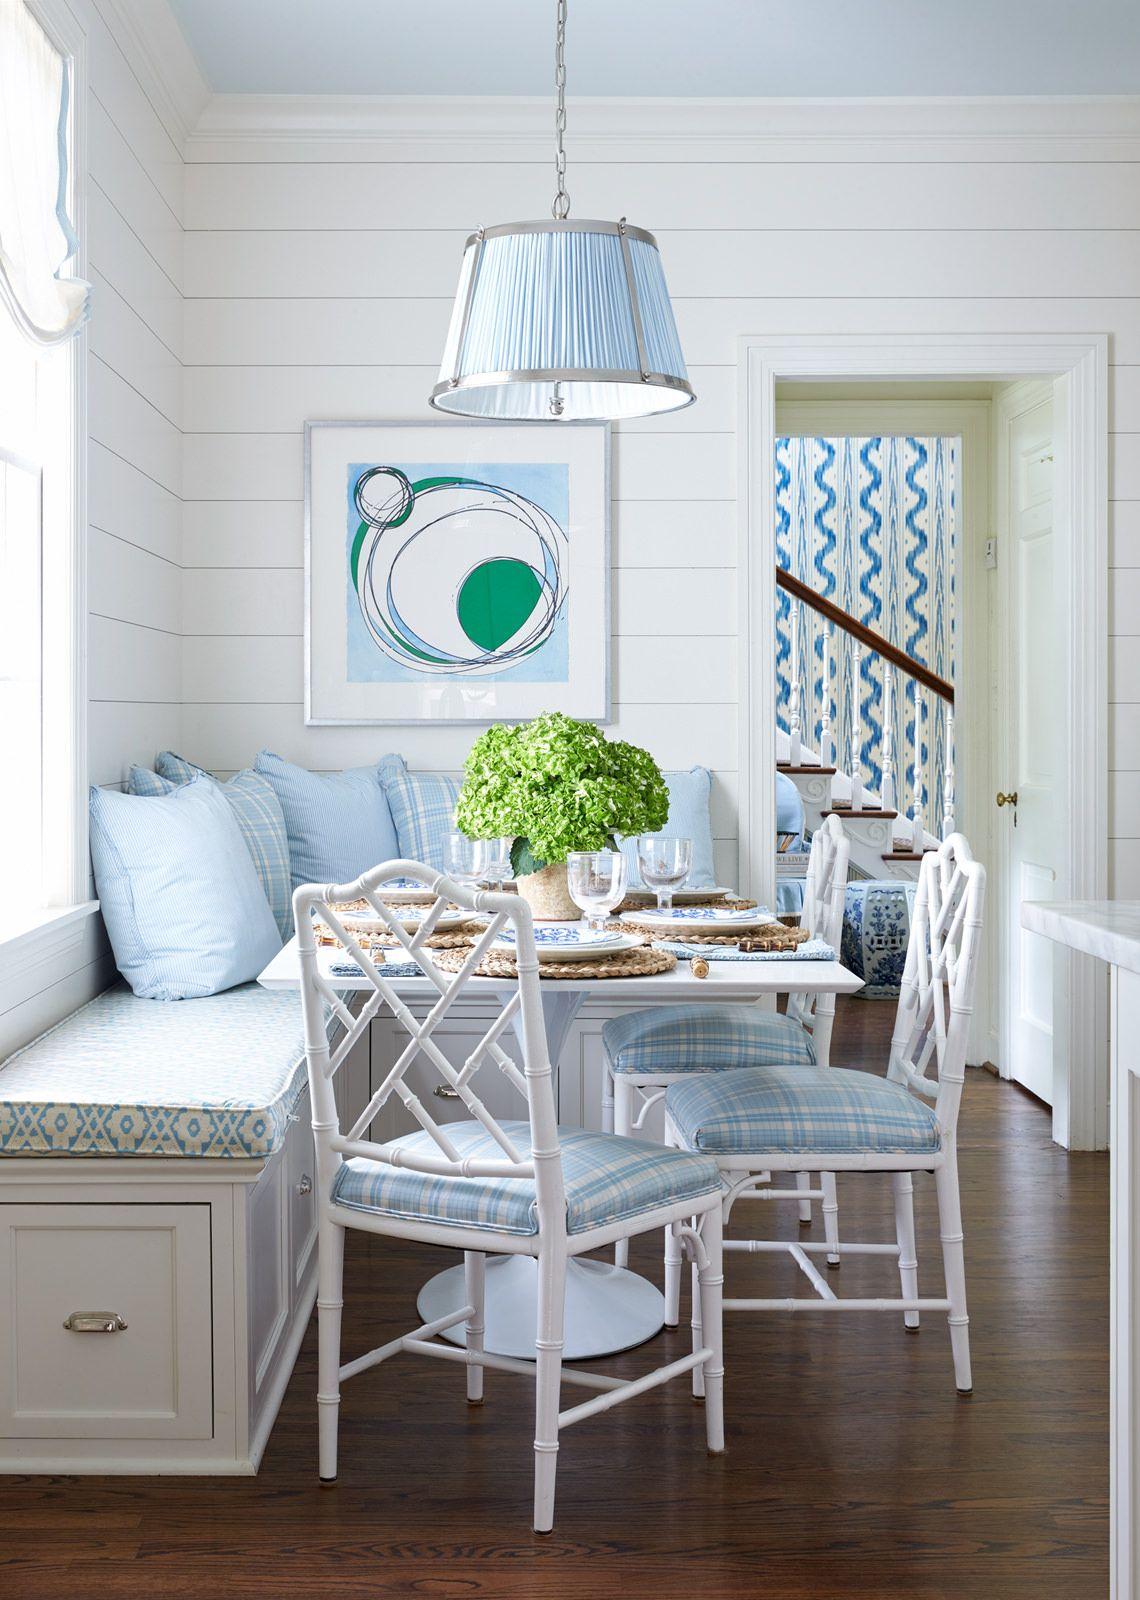 corner banquette breakfast nook | Dining Spaces | Pinterest | Corner ...